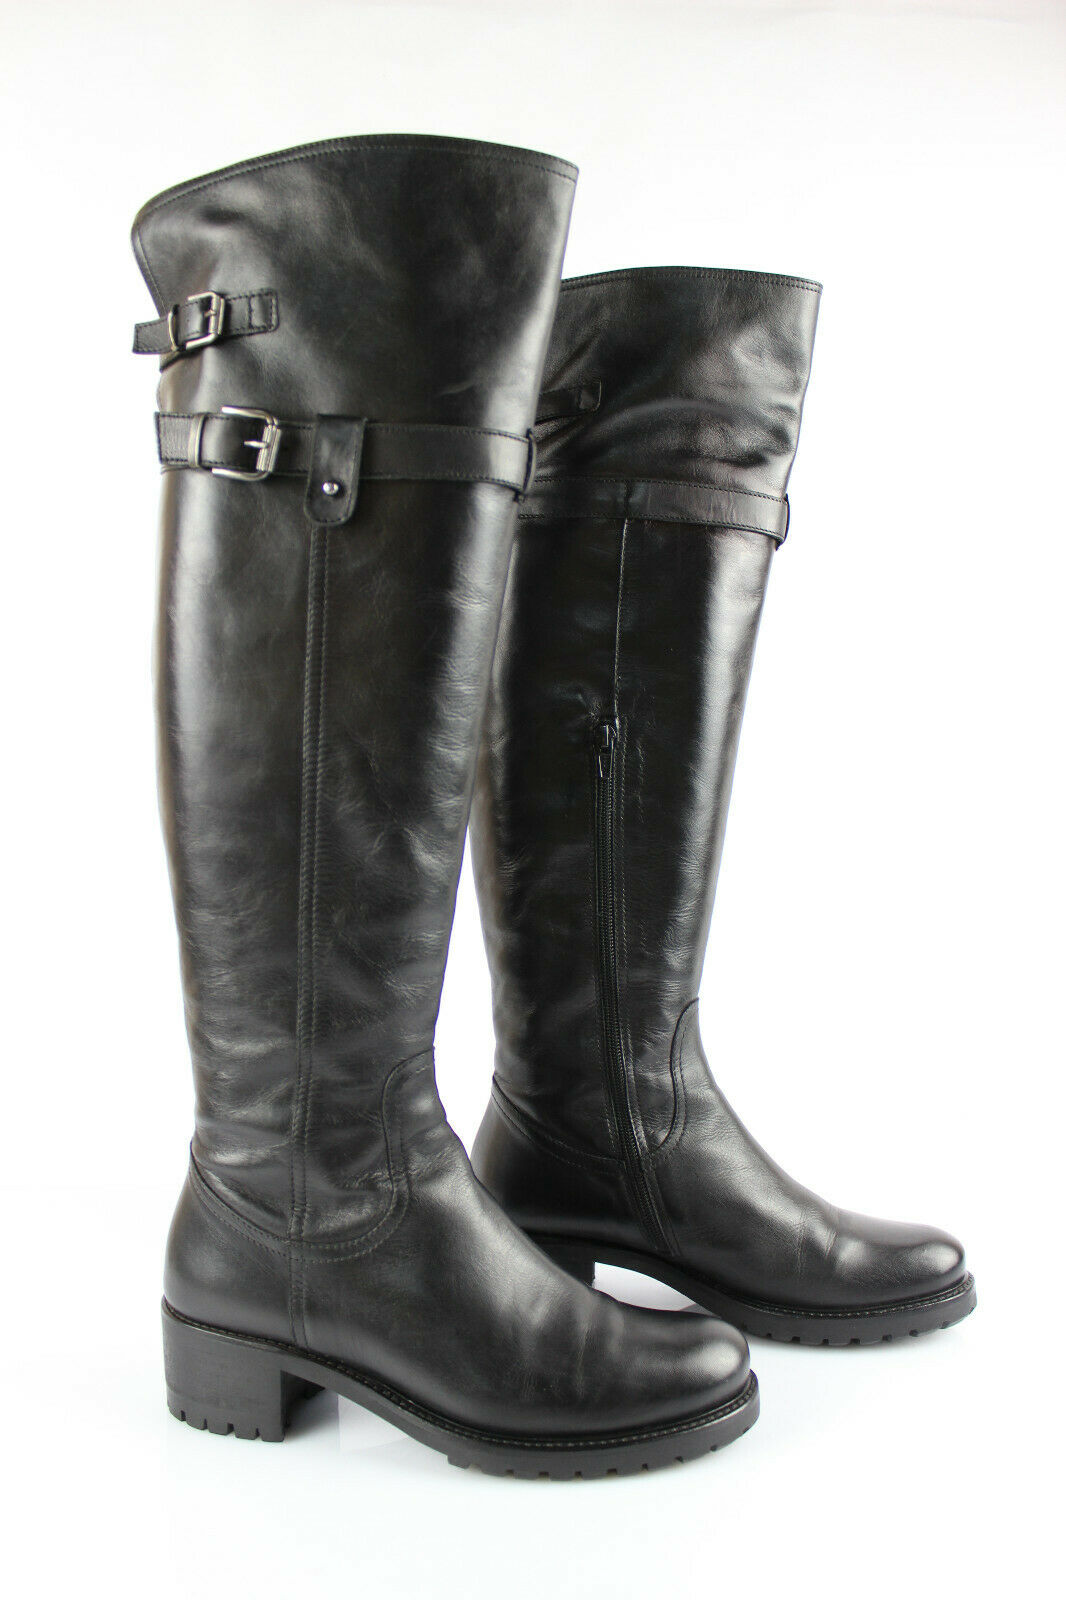 Minelli Hohe Stiefel Schwarzes Leder UK 5   De 38